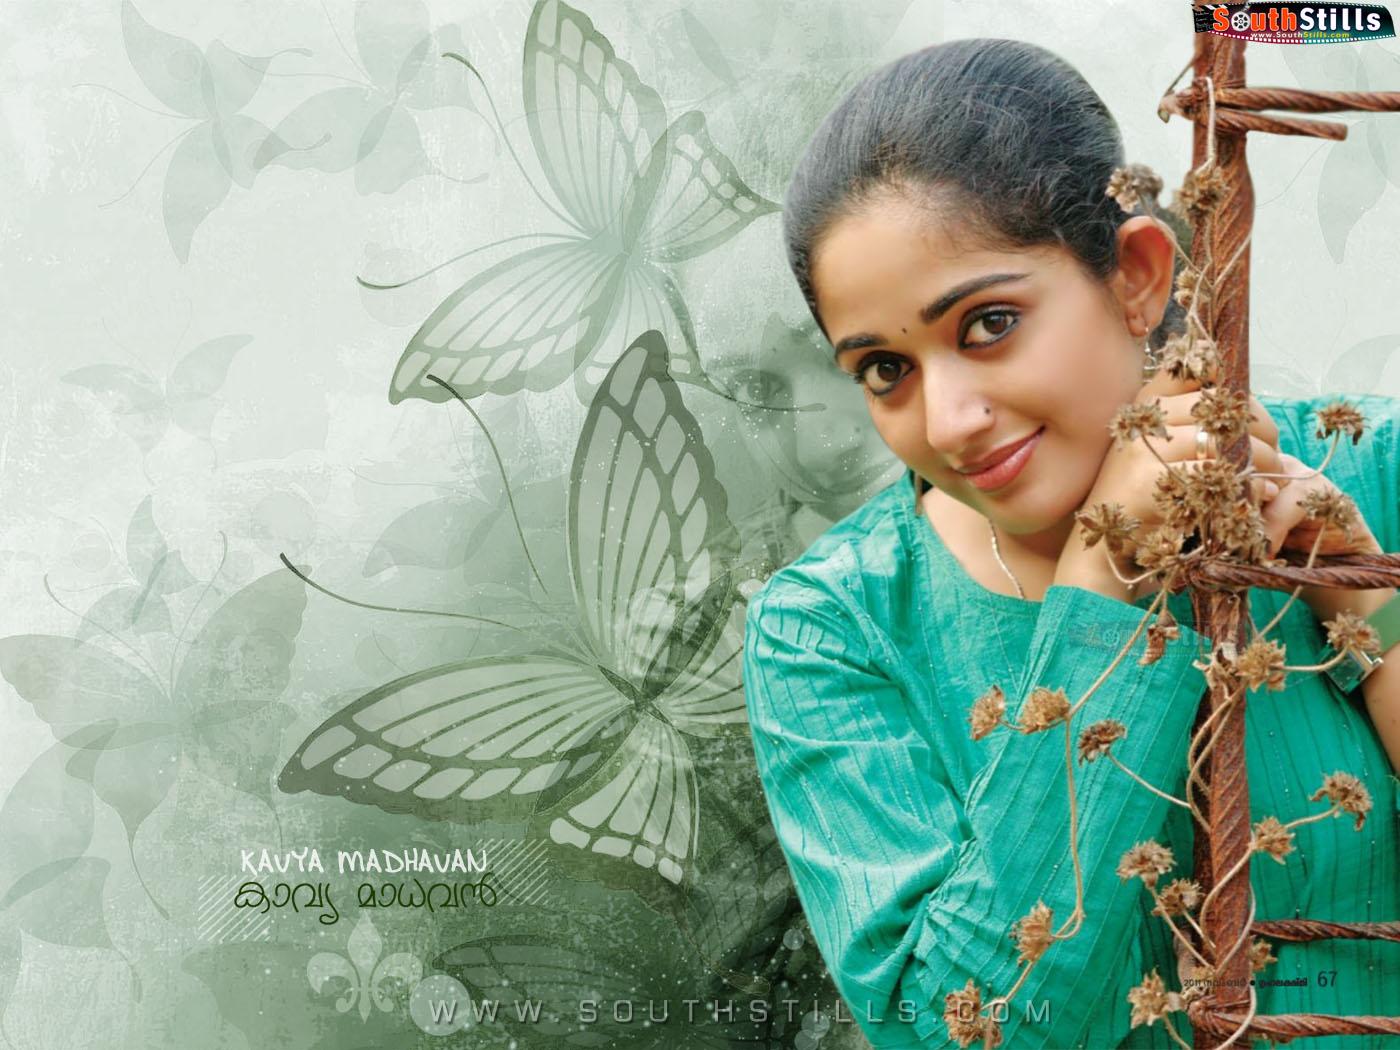 Kavya madhan.....The Most Beautiful Malayalam Actress ...